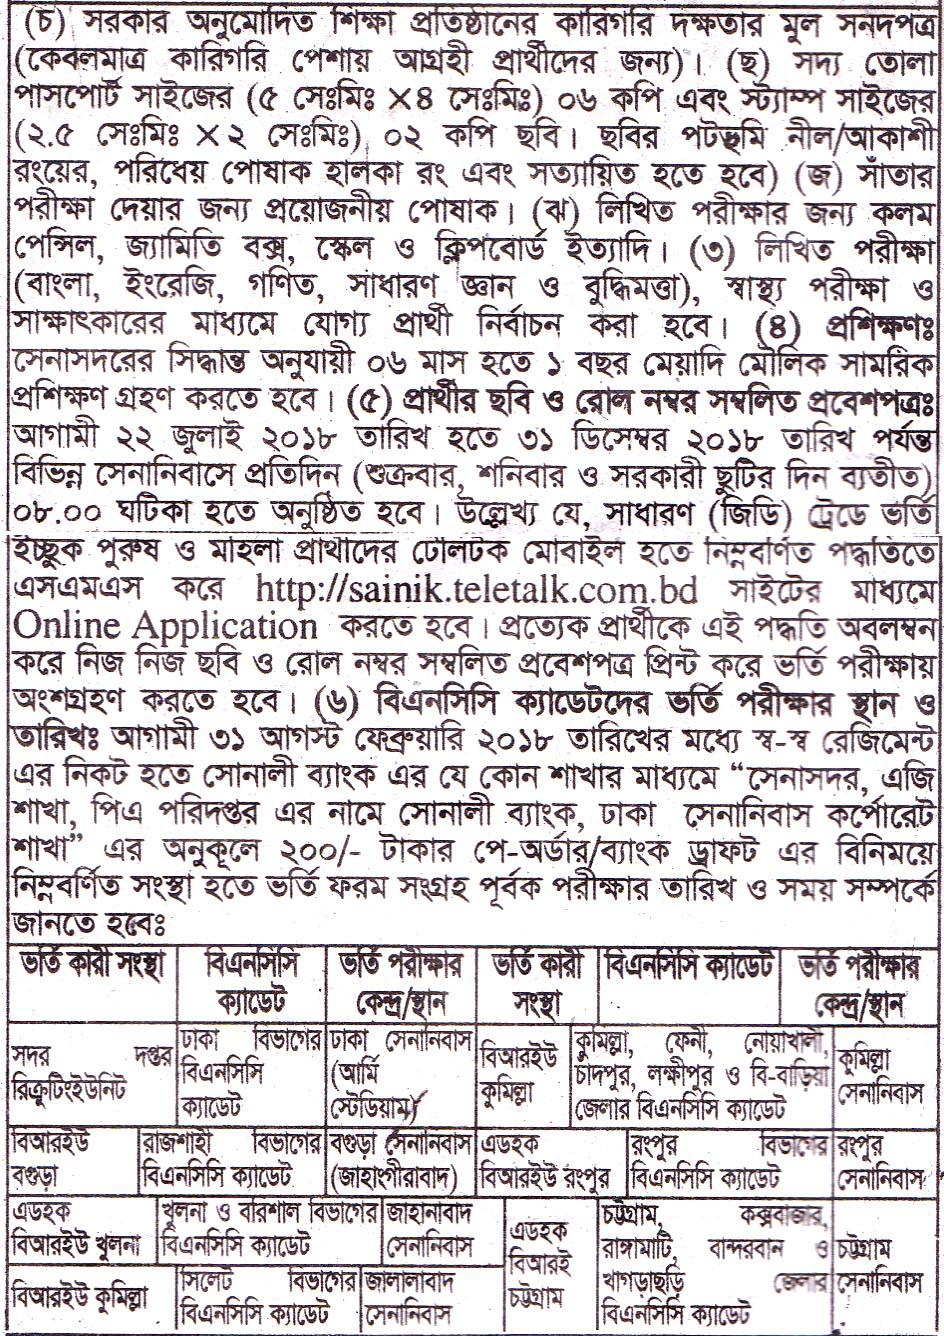 bangladesh army Sainik Job Circular | Admit Card | Exam Result | 2018